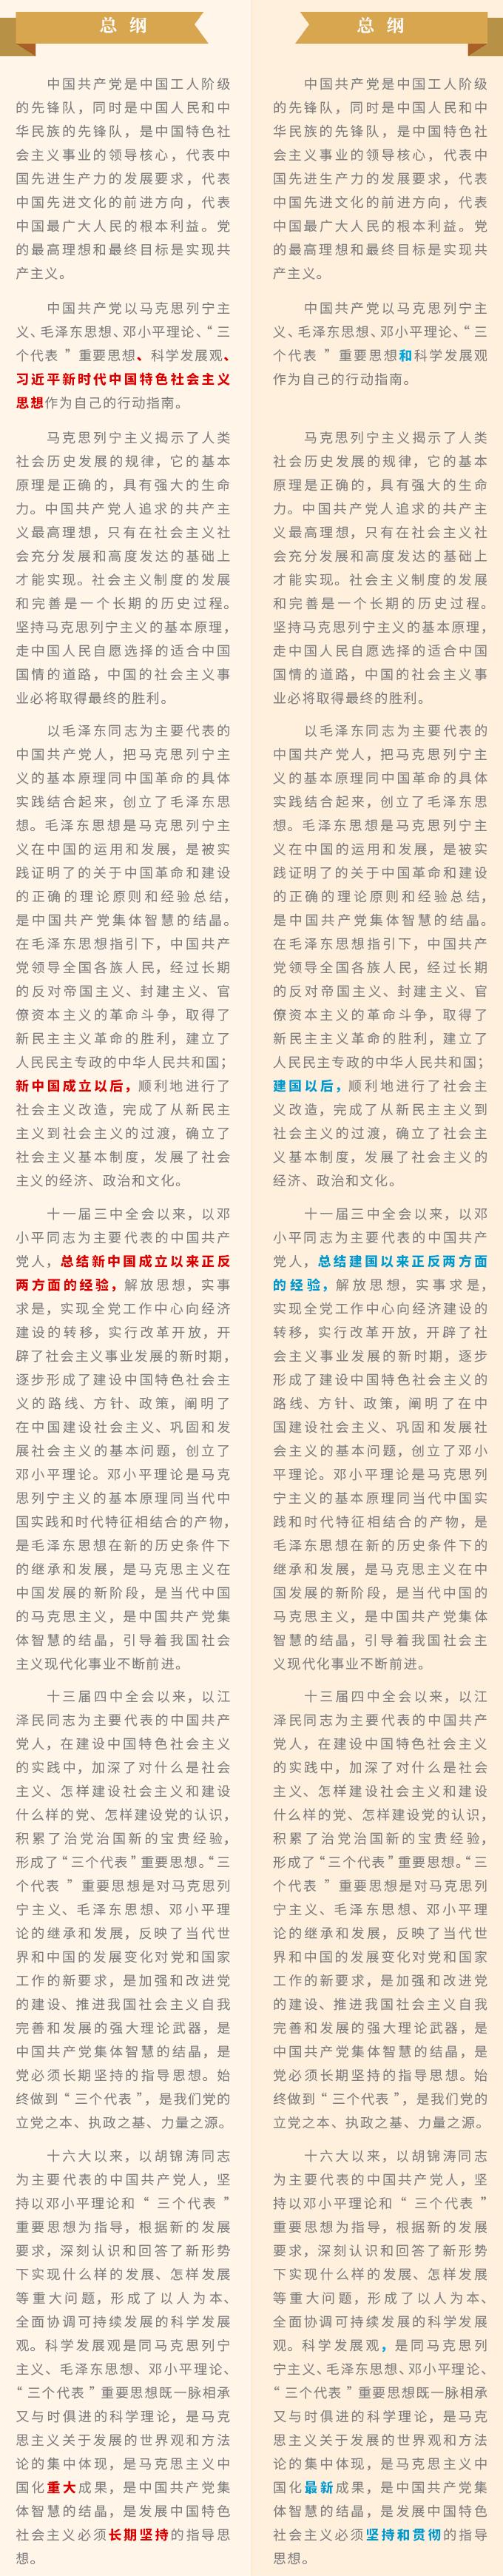 http://www.ccdi.gov.cn/yw/201710/W020171031664657773304.png